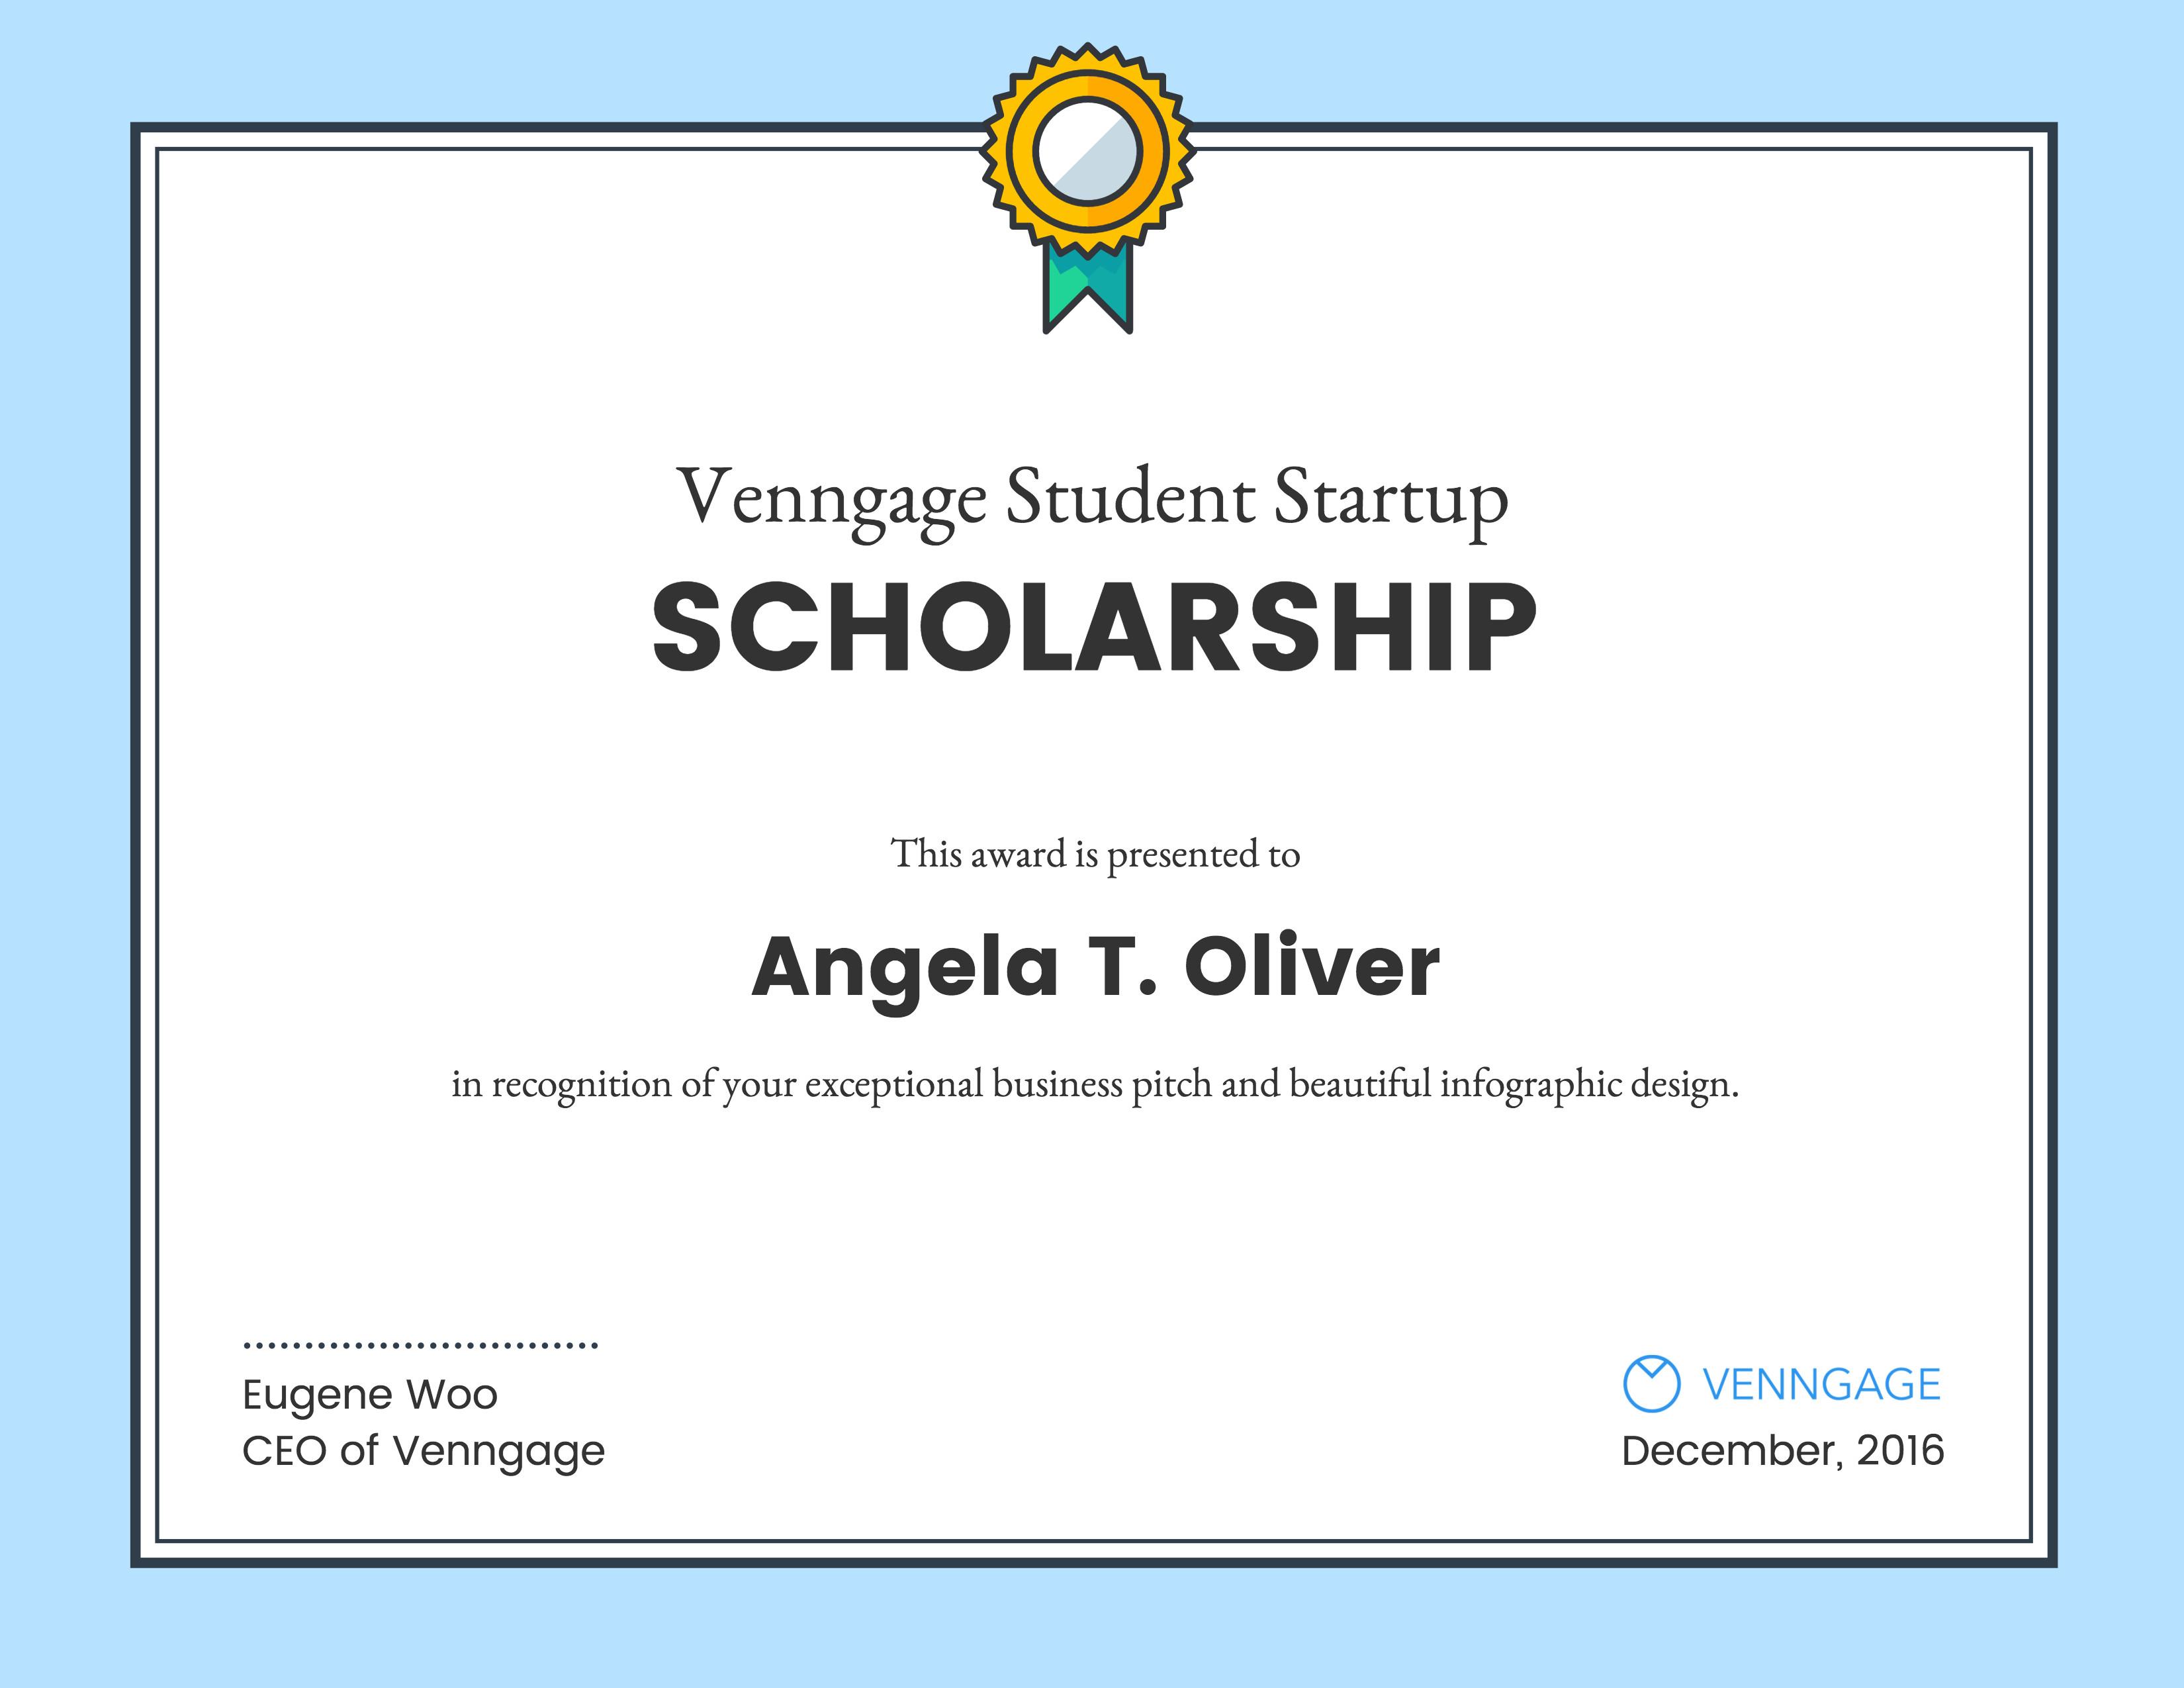 Scholarship Certificate Template Free Venngage Student Scholarship Winners Venngage